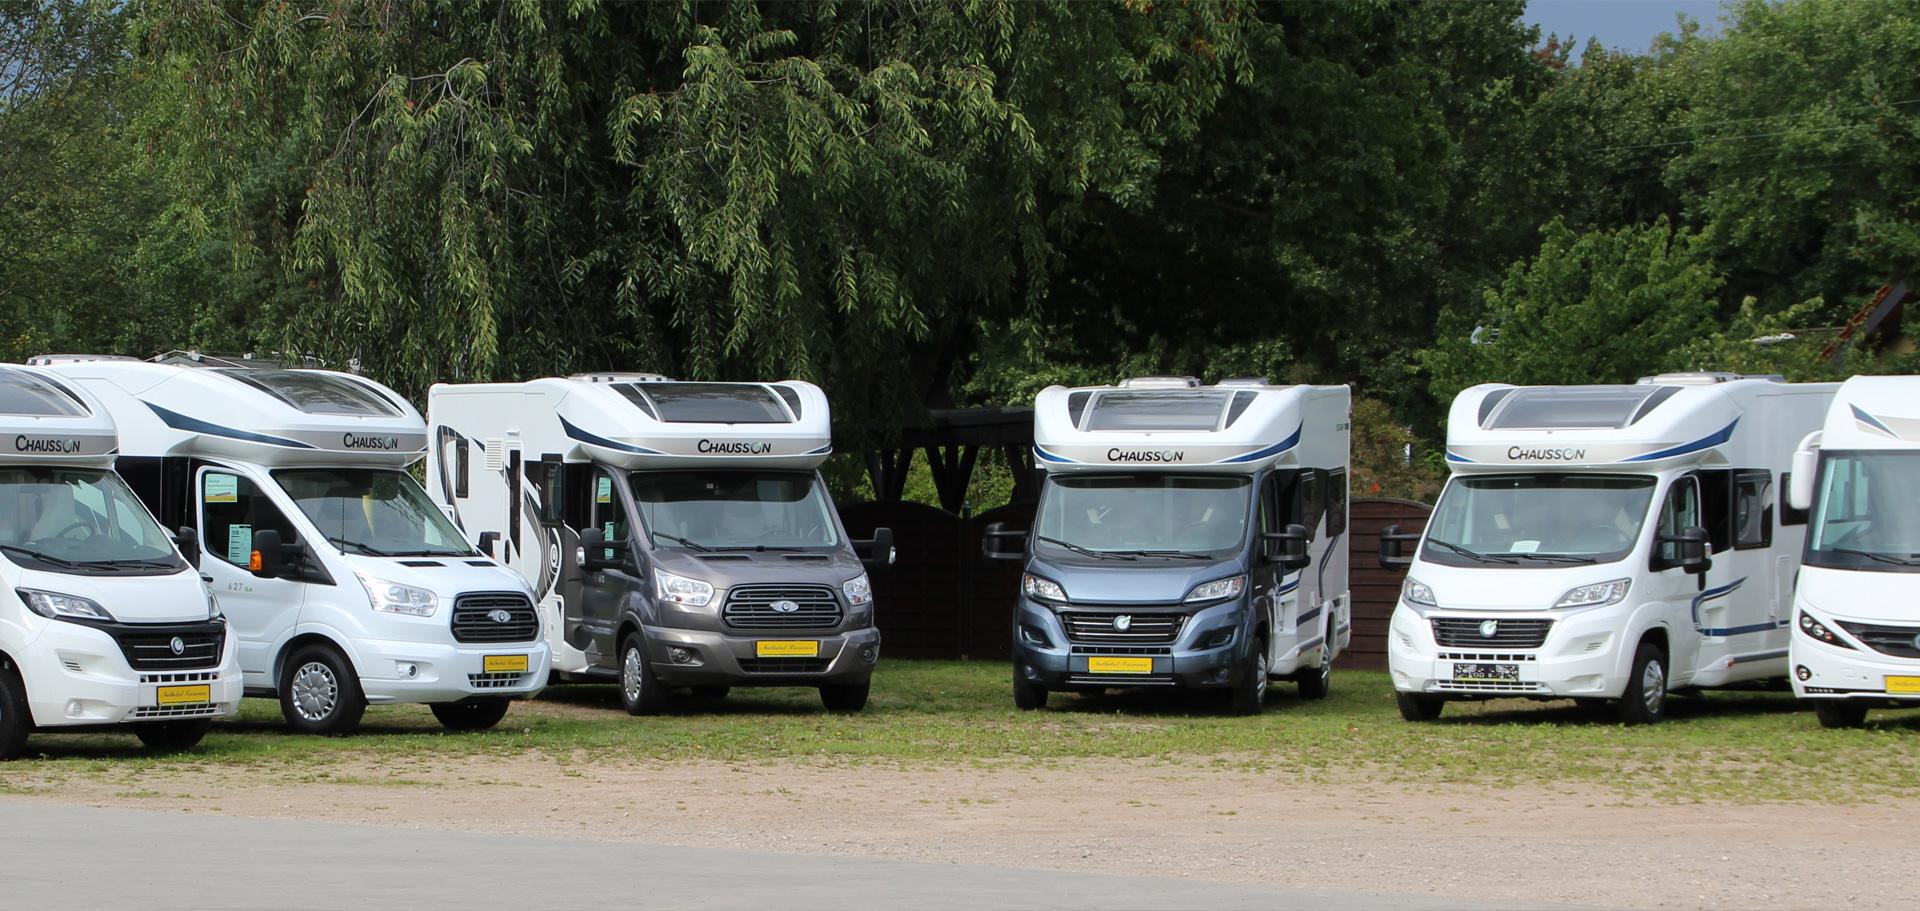 Uitgelezene Nuthetal Caravan GmbH - Wohnmobile, Wohnwagen, Reisemobile kaufen KF-16